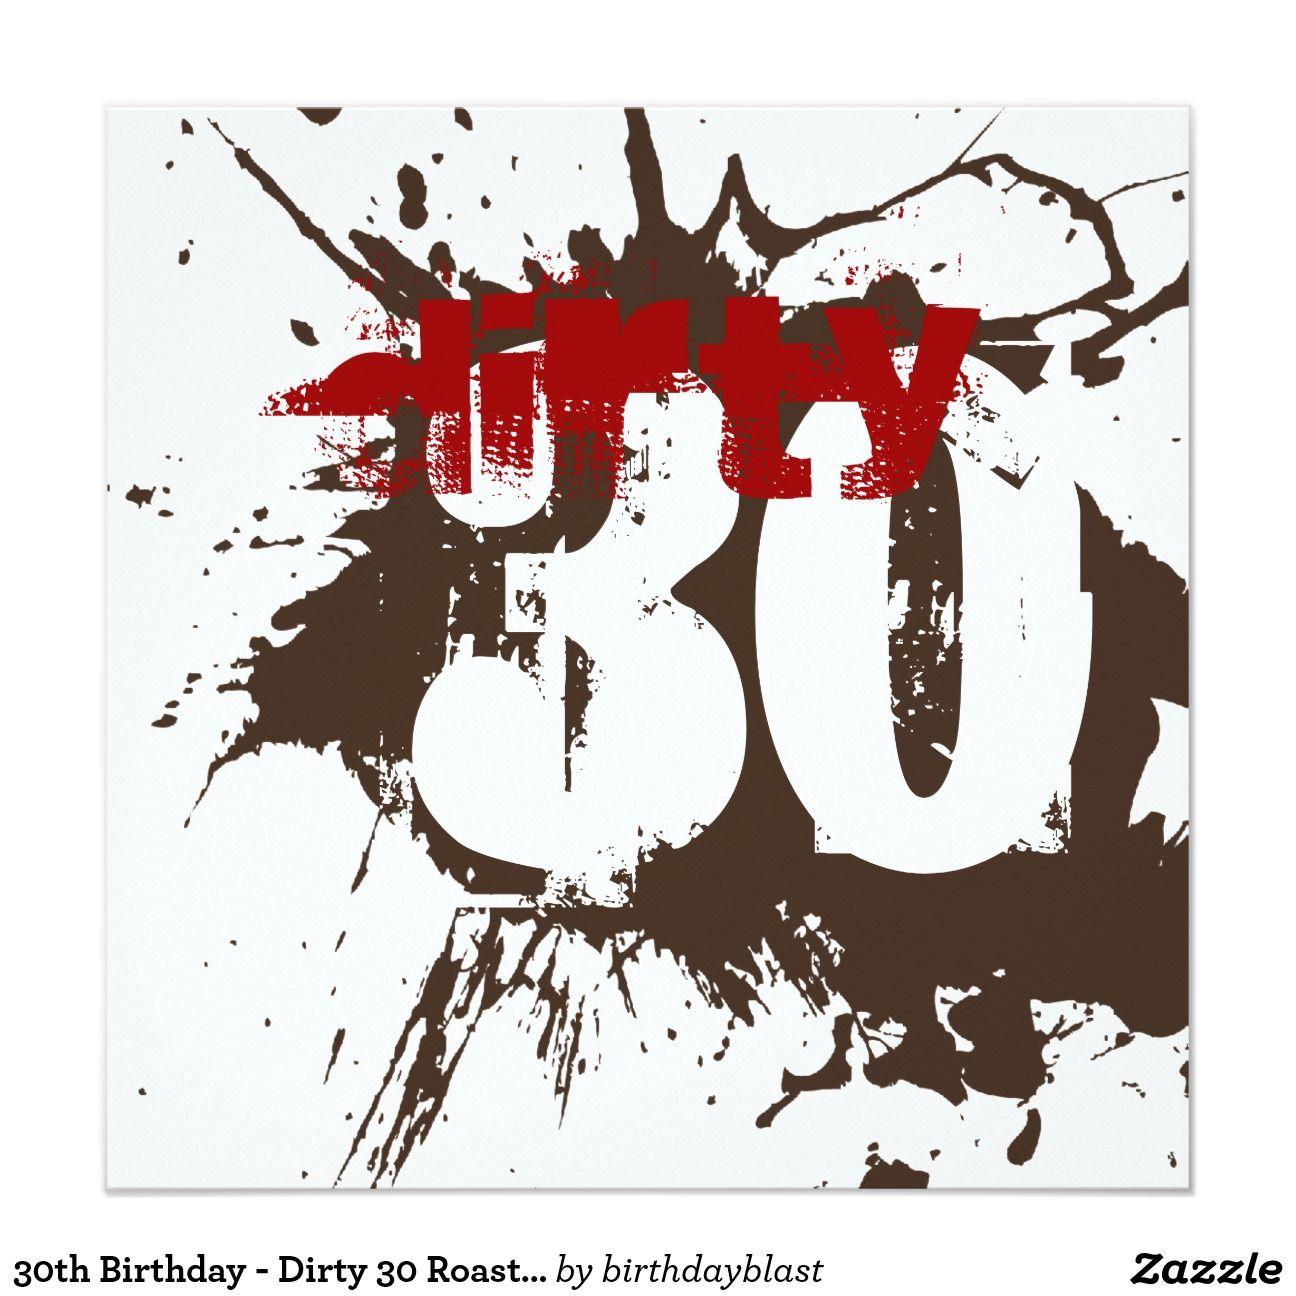 30th Birthday - Dirty 30 Roast & Dirt Party Invite | Pinterest | 30 ...